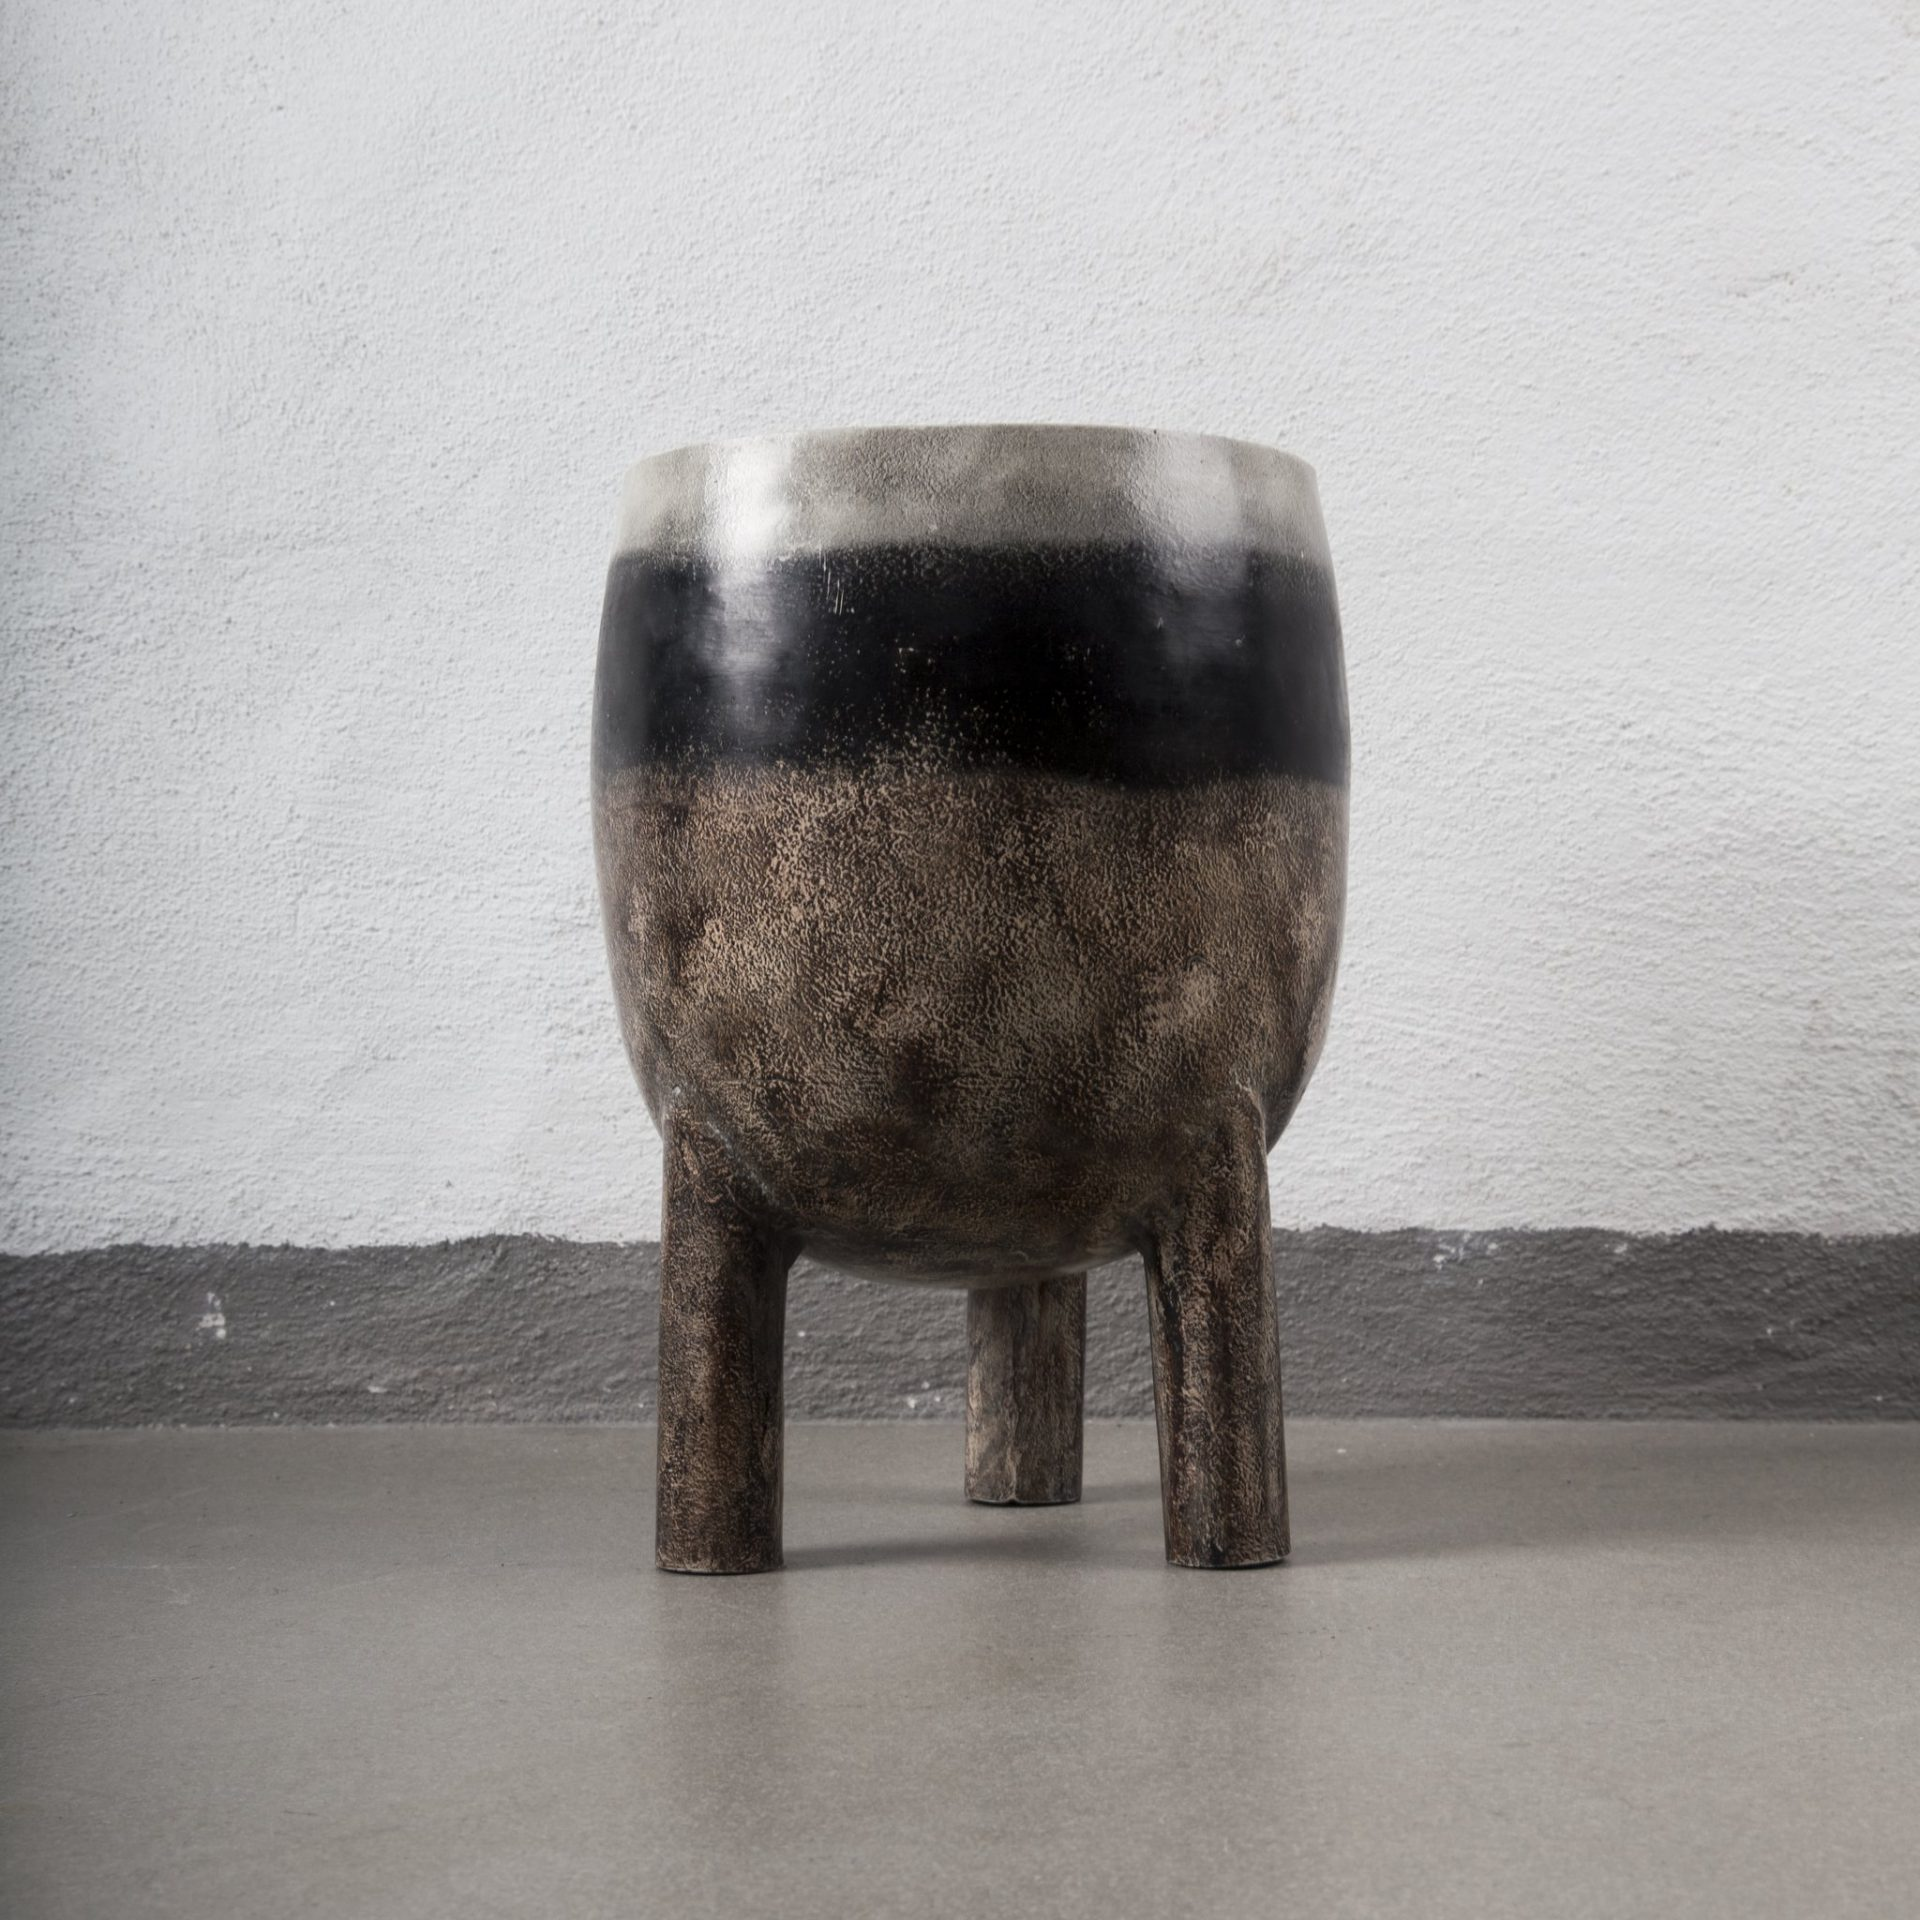 Vase gallery